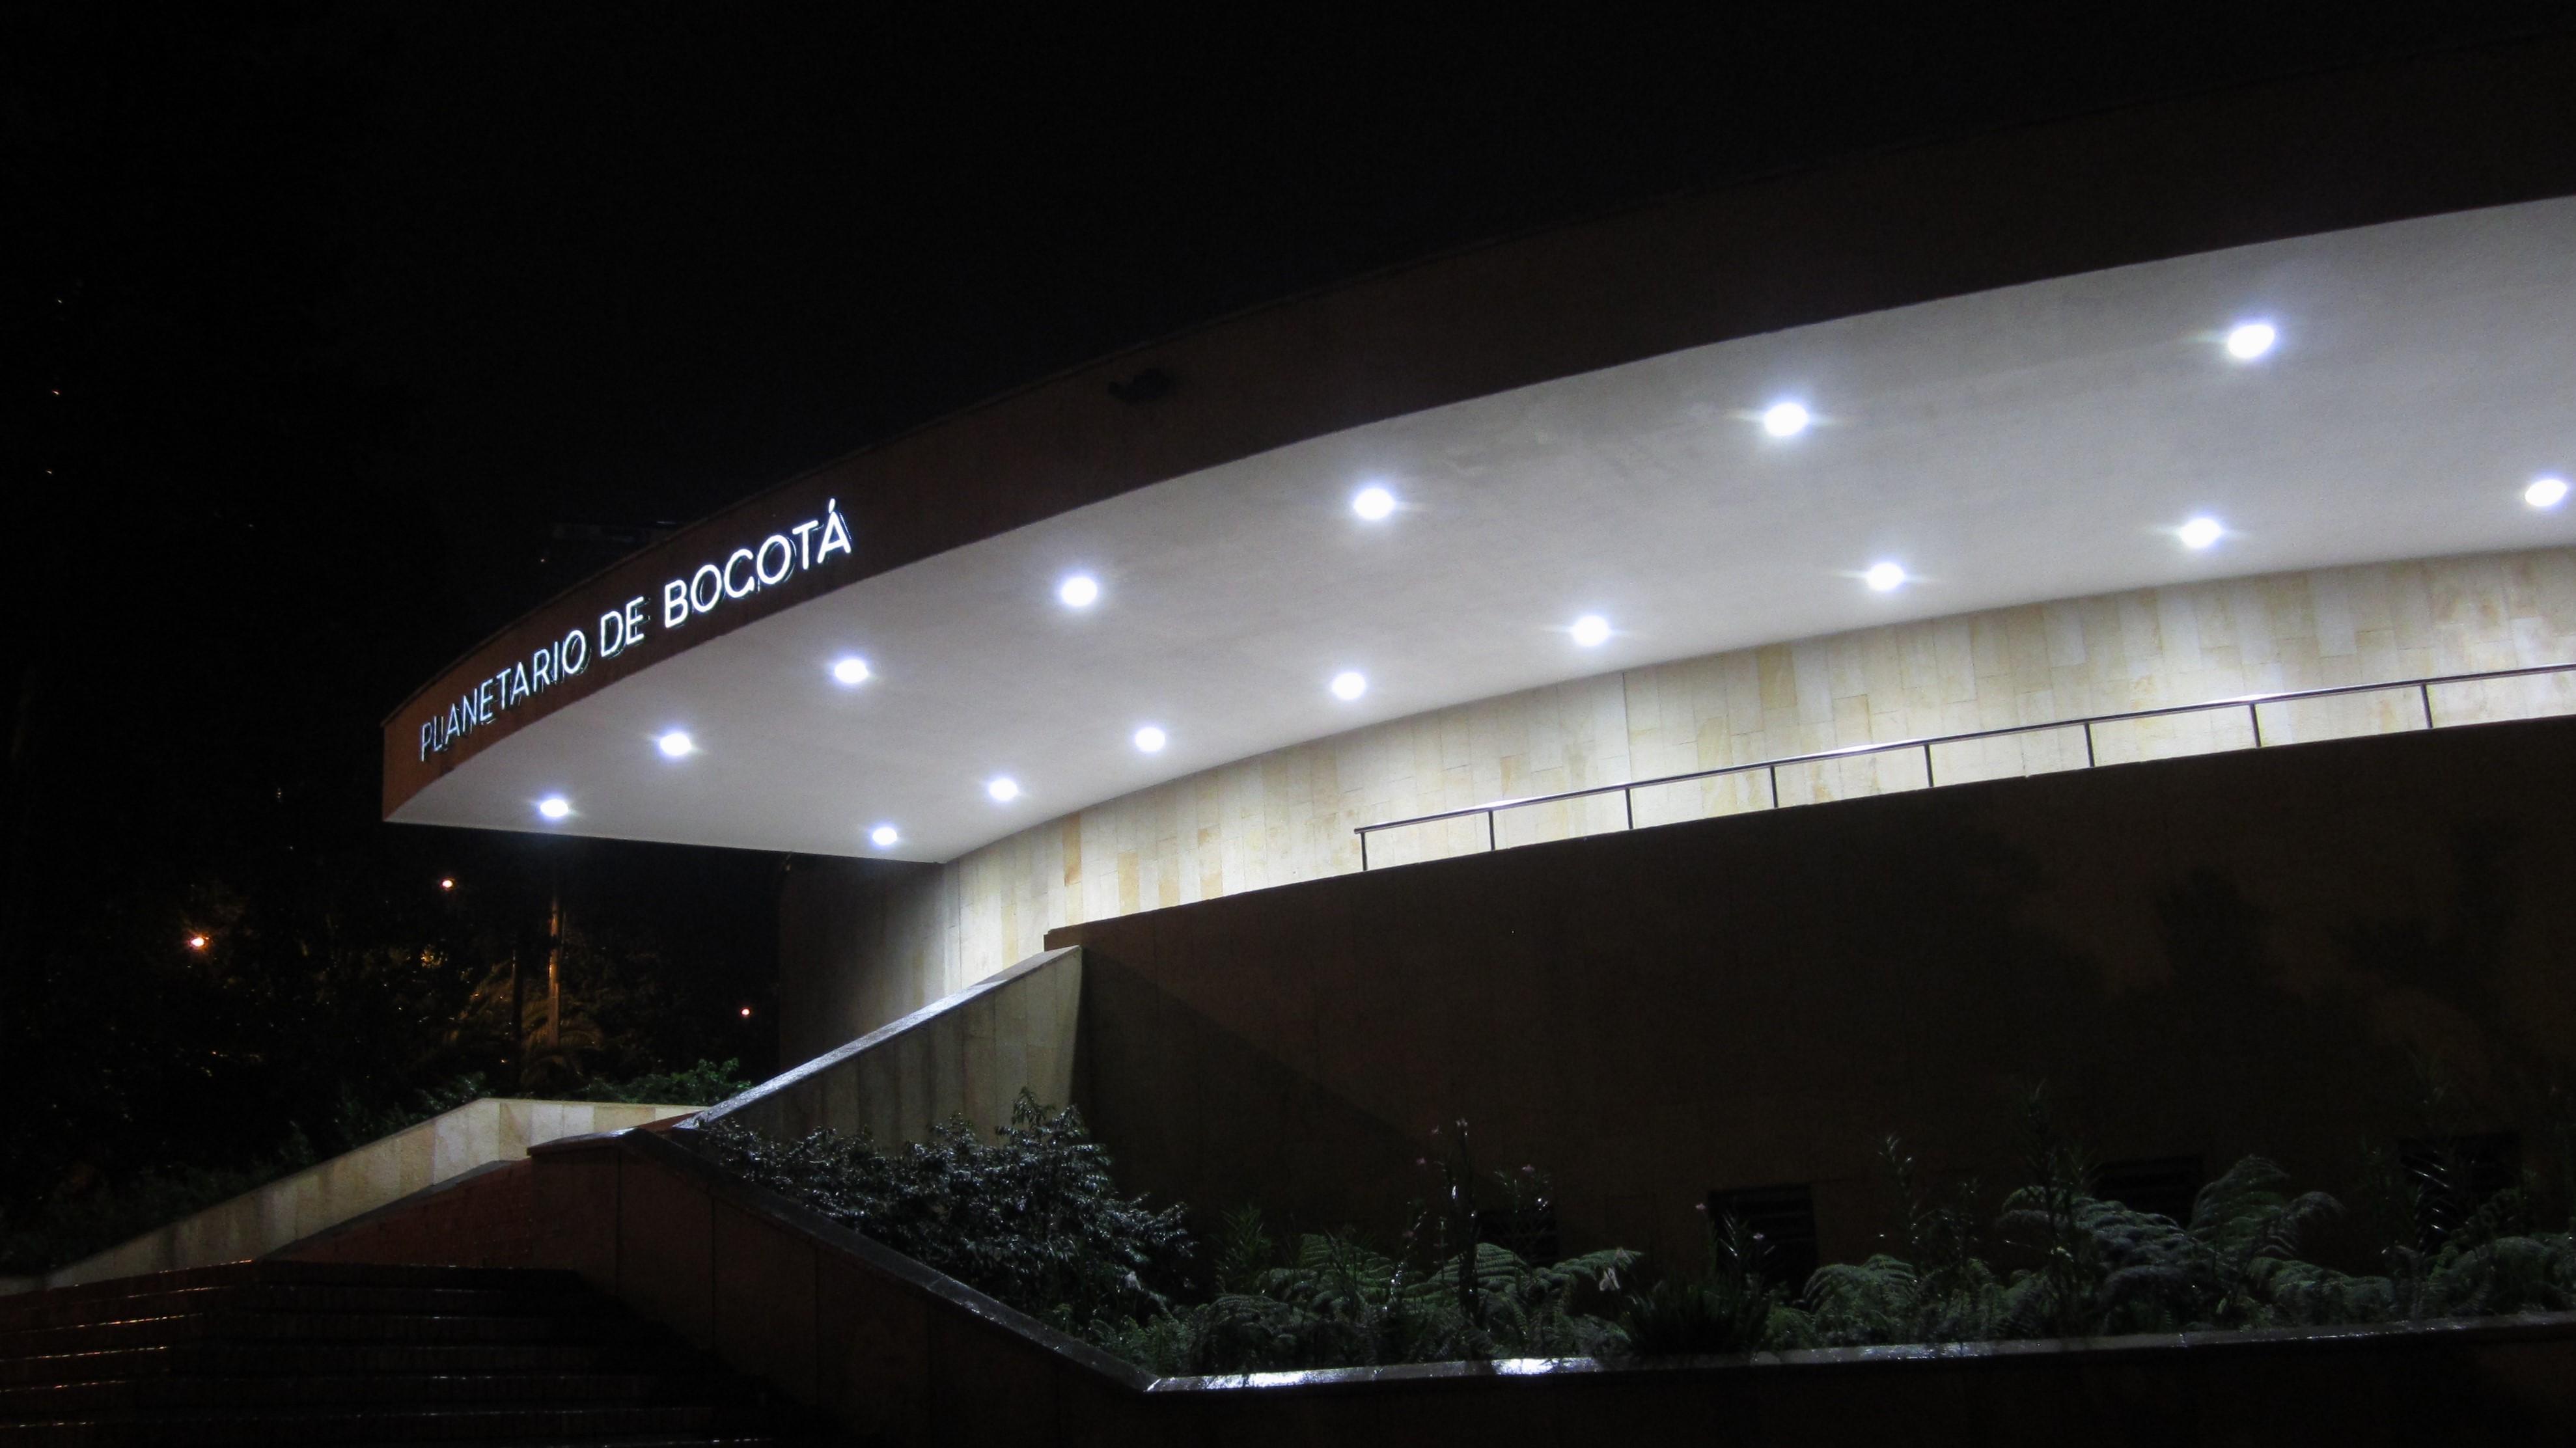 Bogot Planetario Distrital